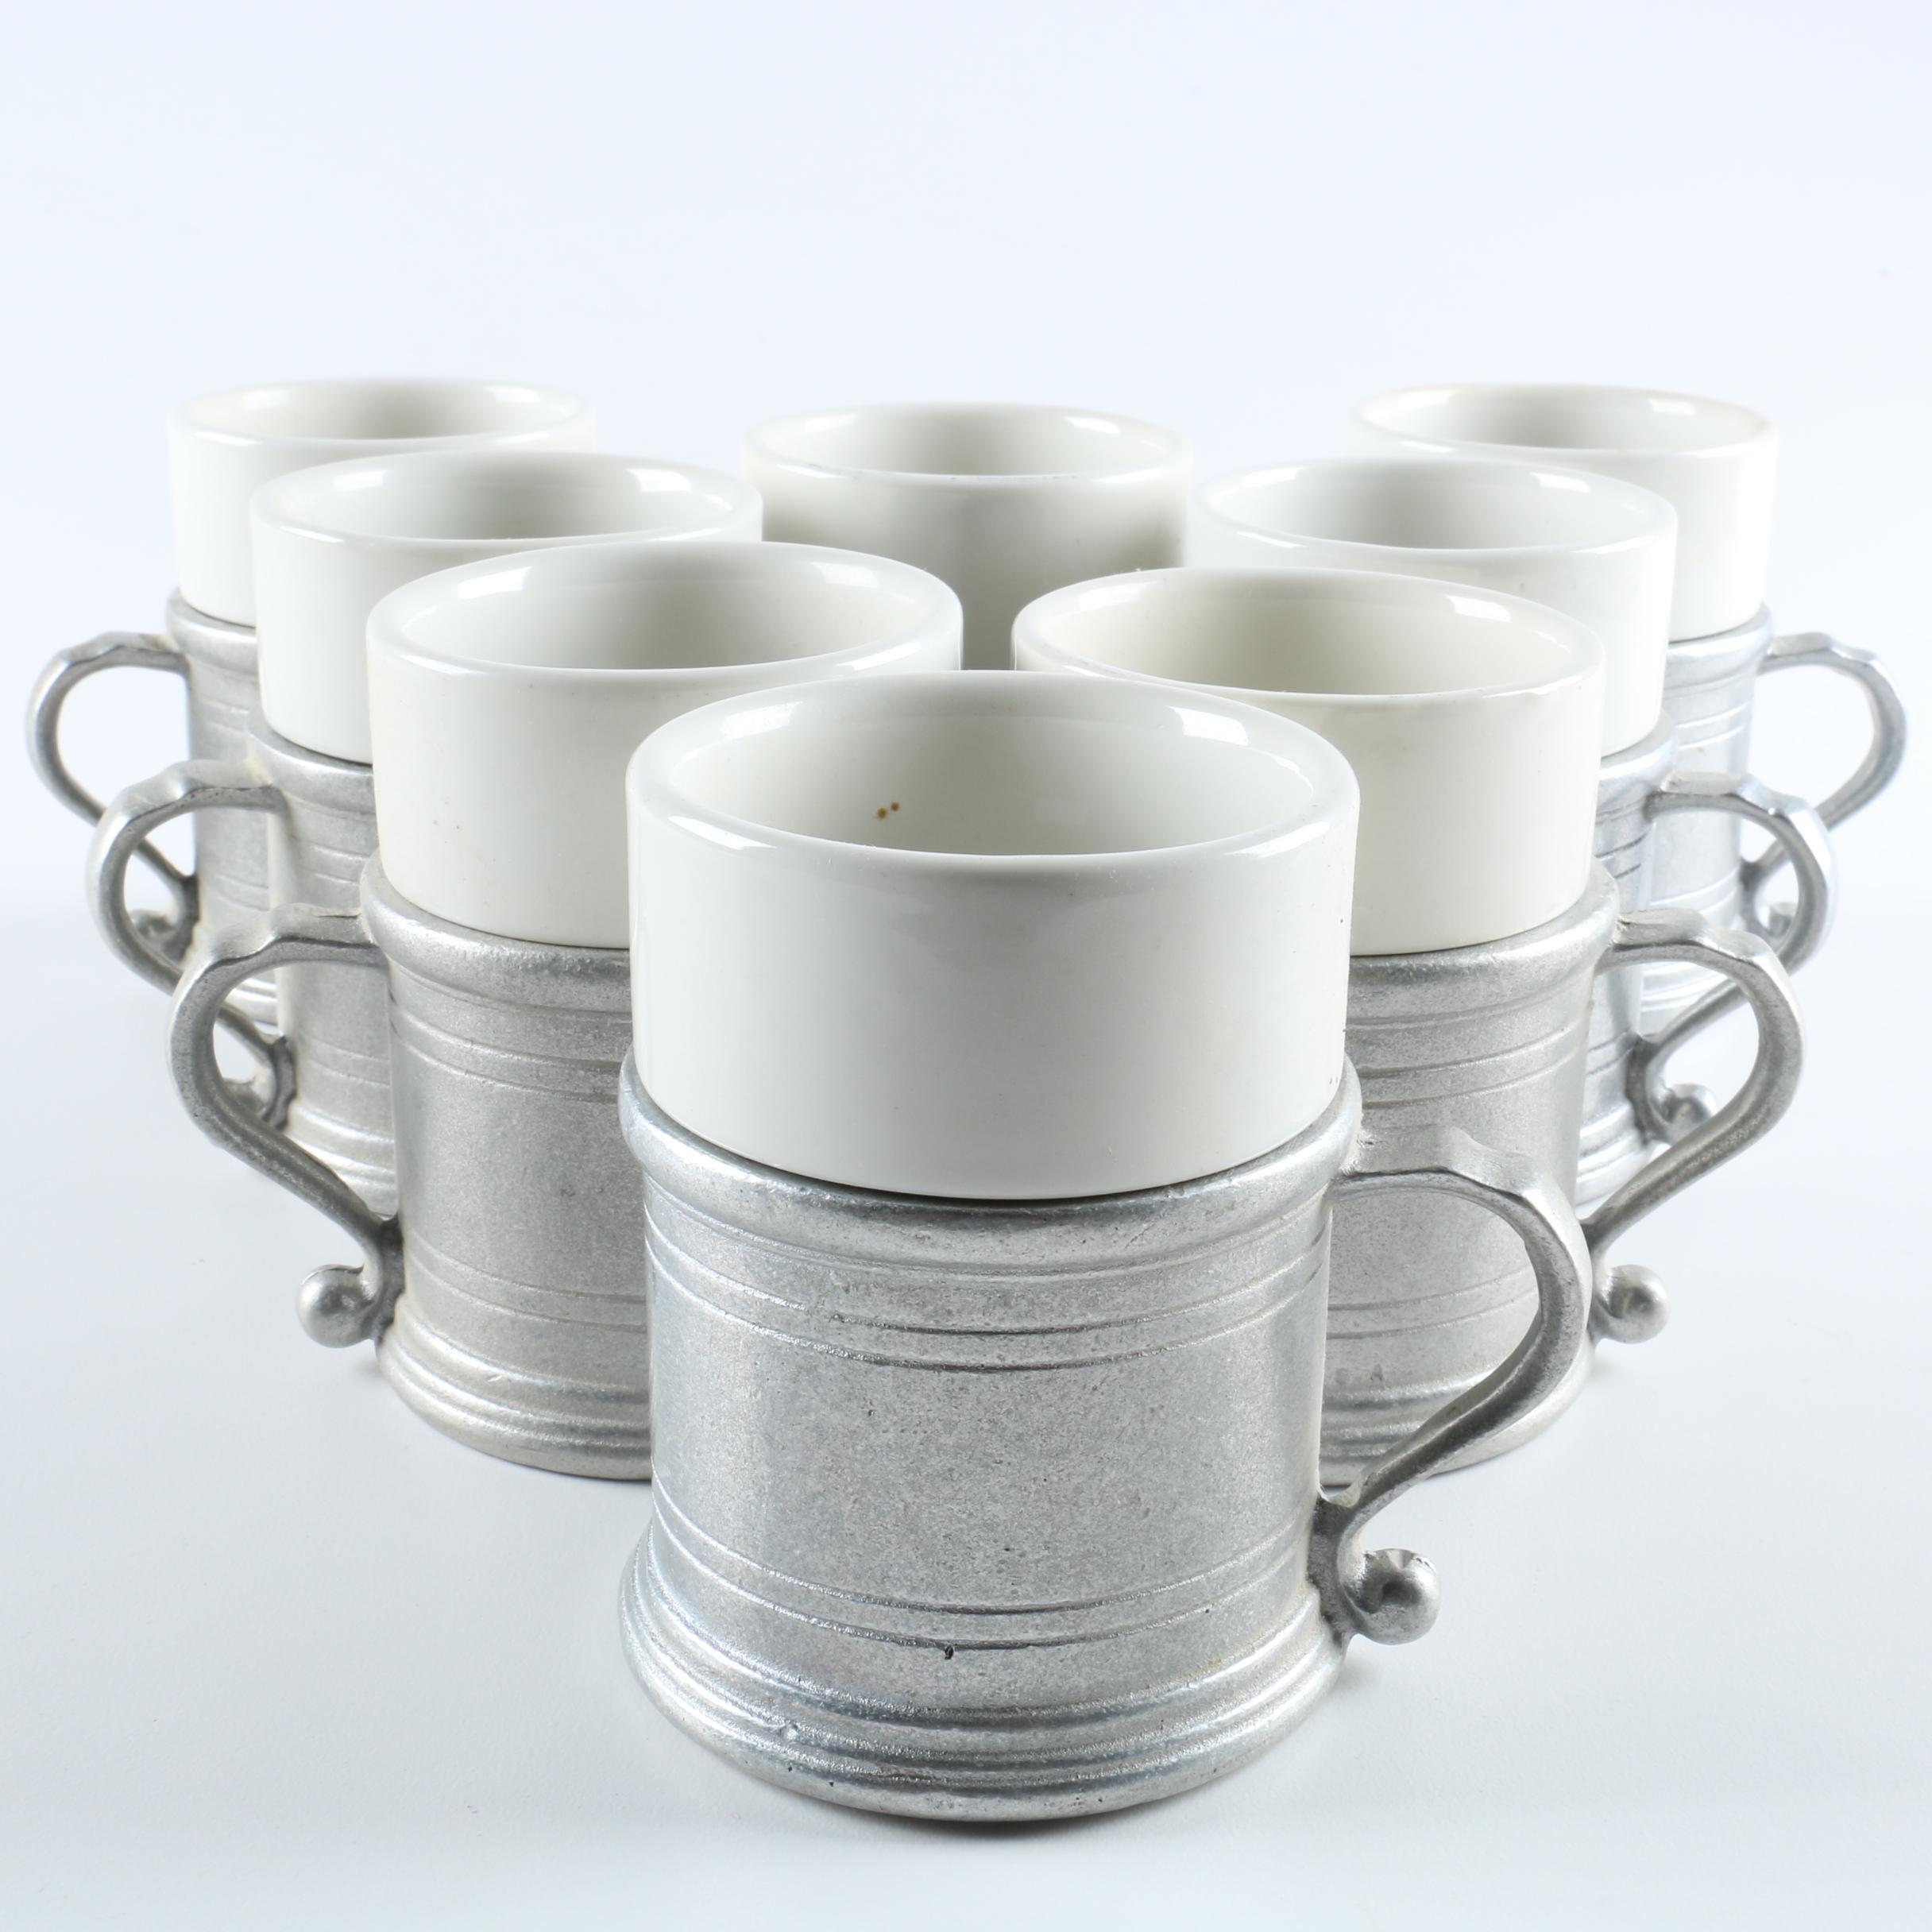 Wilton Armetale Ceramic and Pewter Mug Sets